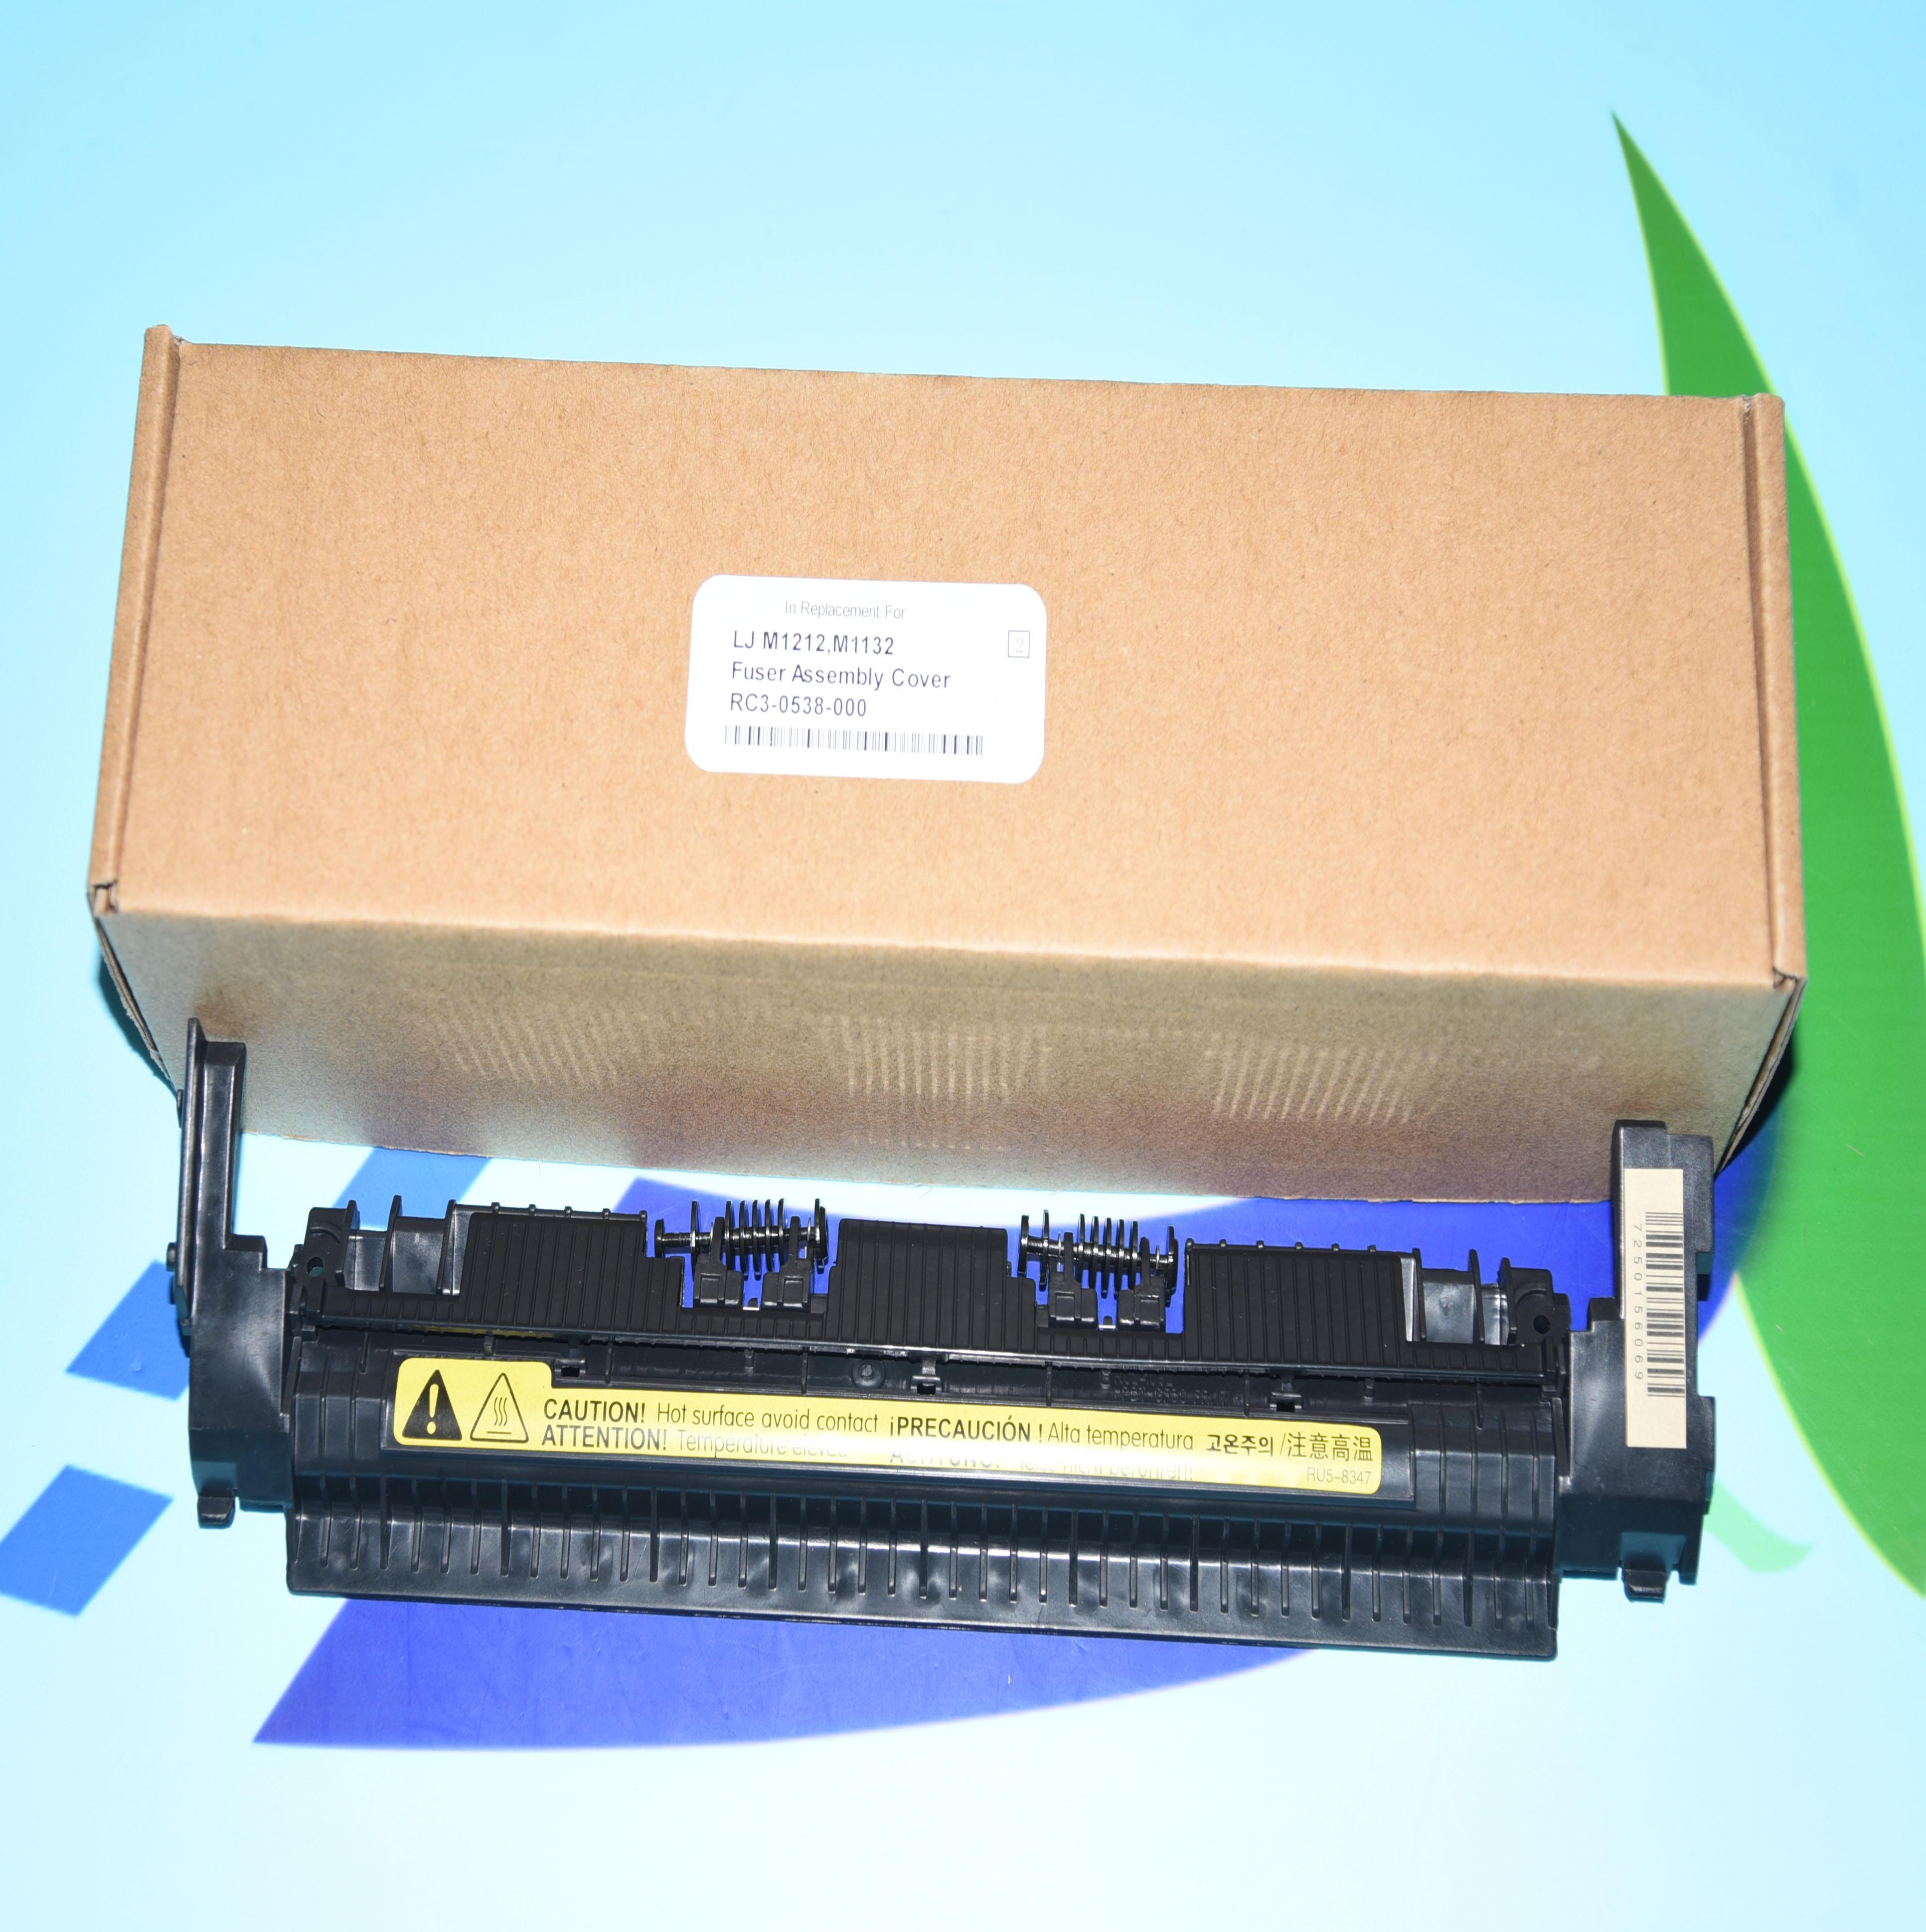 Conjunto de Fusor para hp Nova Tampa M1132 M125 M127 P1102 P1108 P1005 M100 P1006 1010 1020 1022 3030 3055 1319 2pcs M1212 Rc3-0538